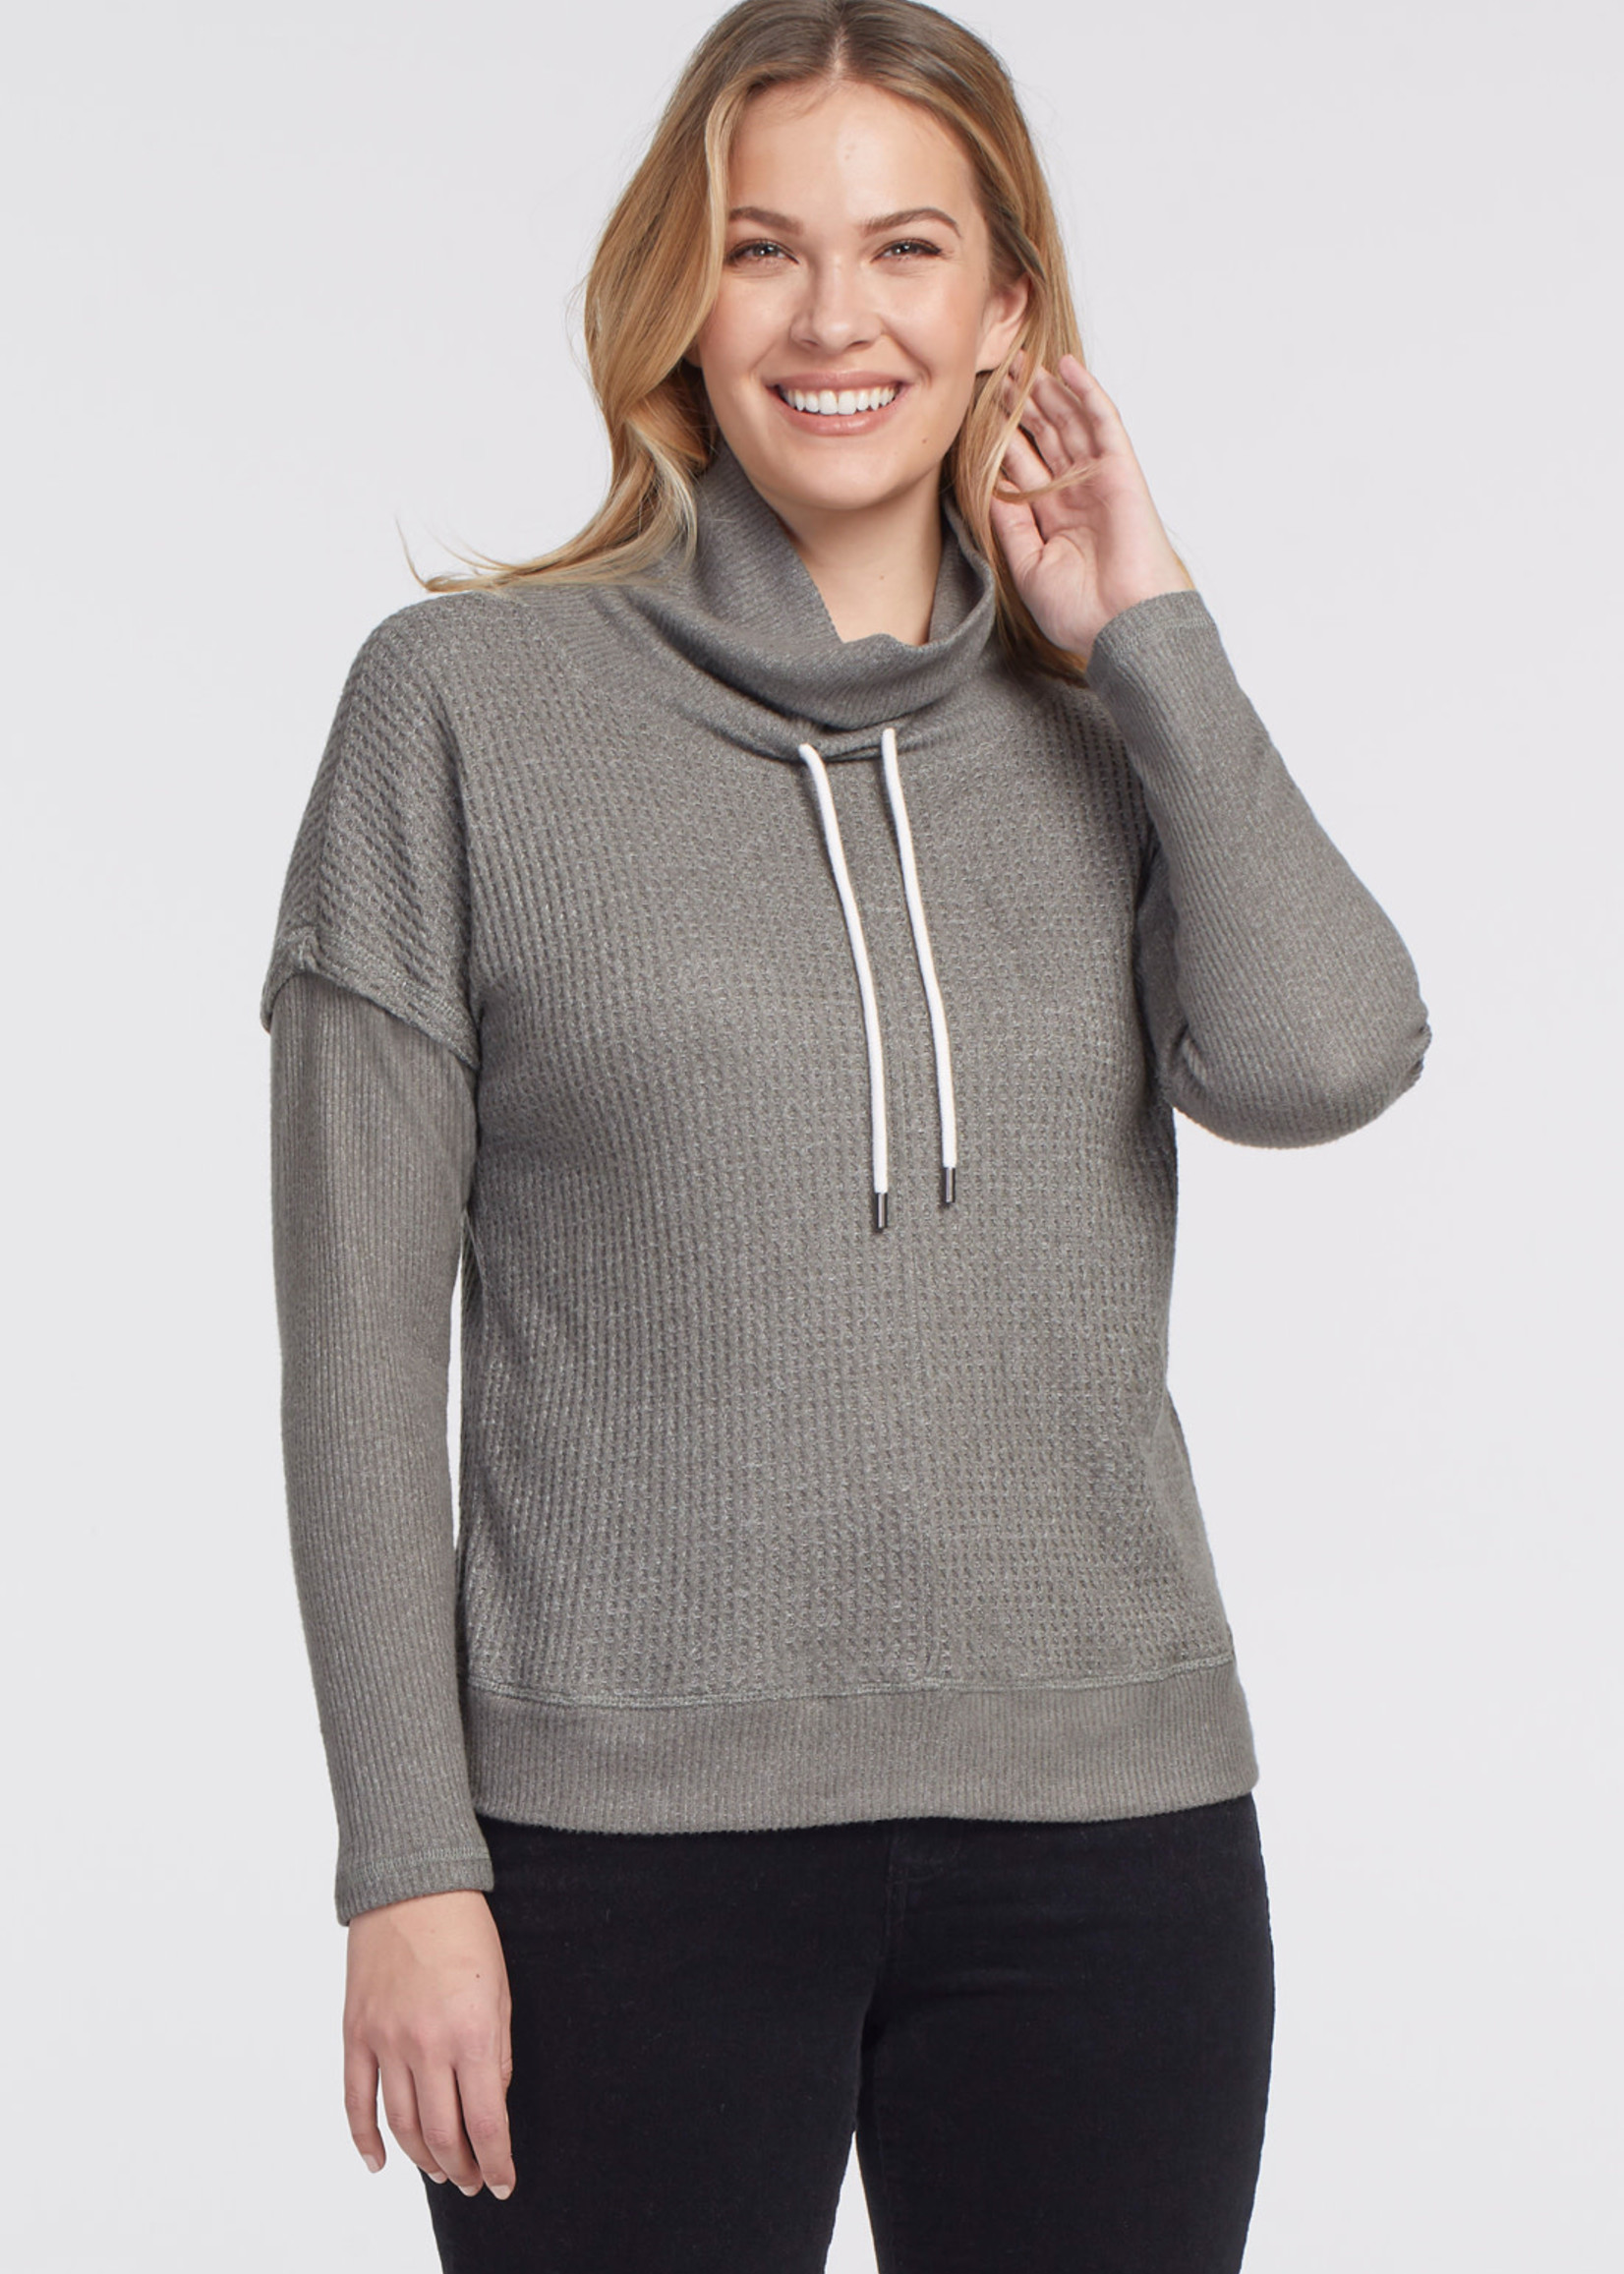 Tribal Tribal  Funnel Neck Sweater w/ Knit Details Dark Laurel